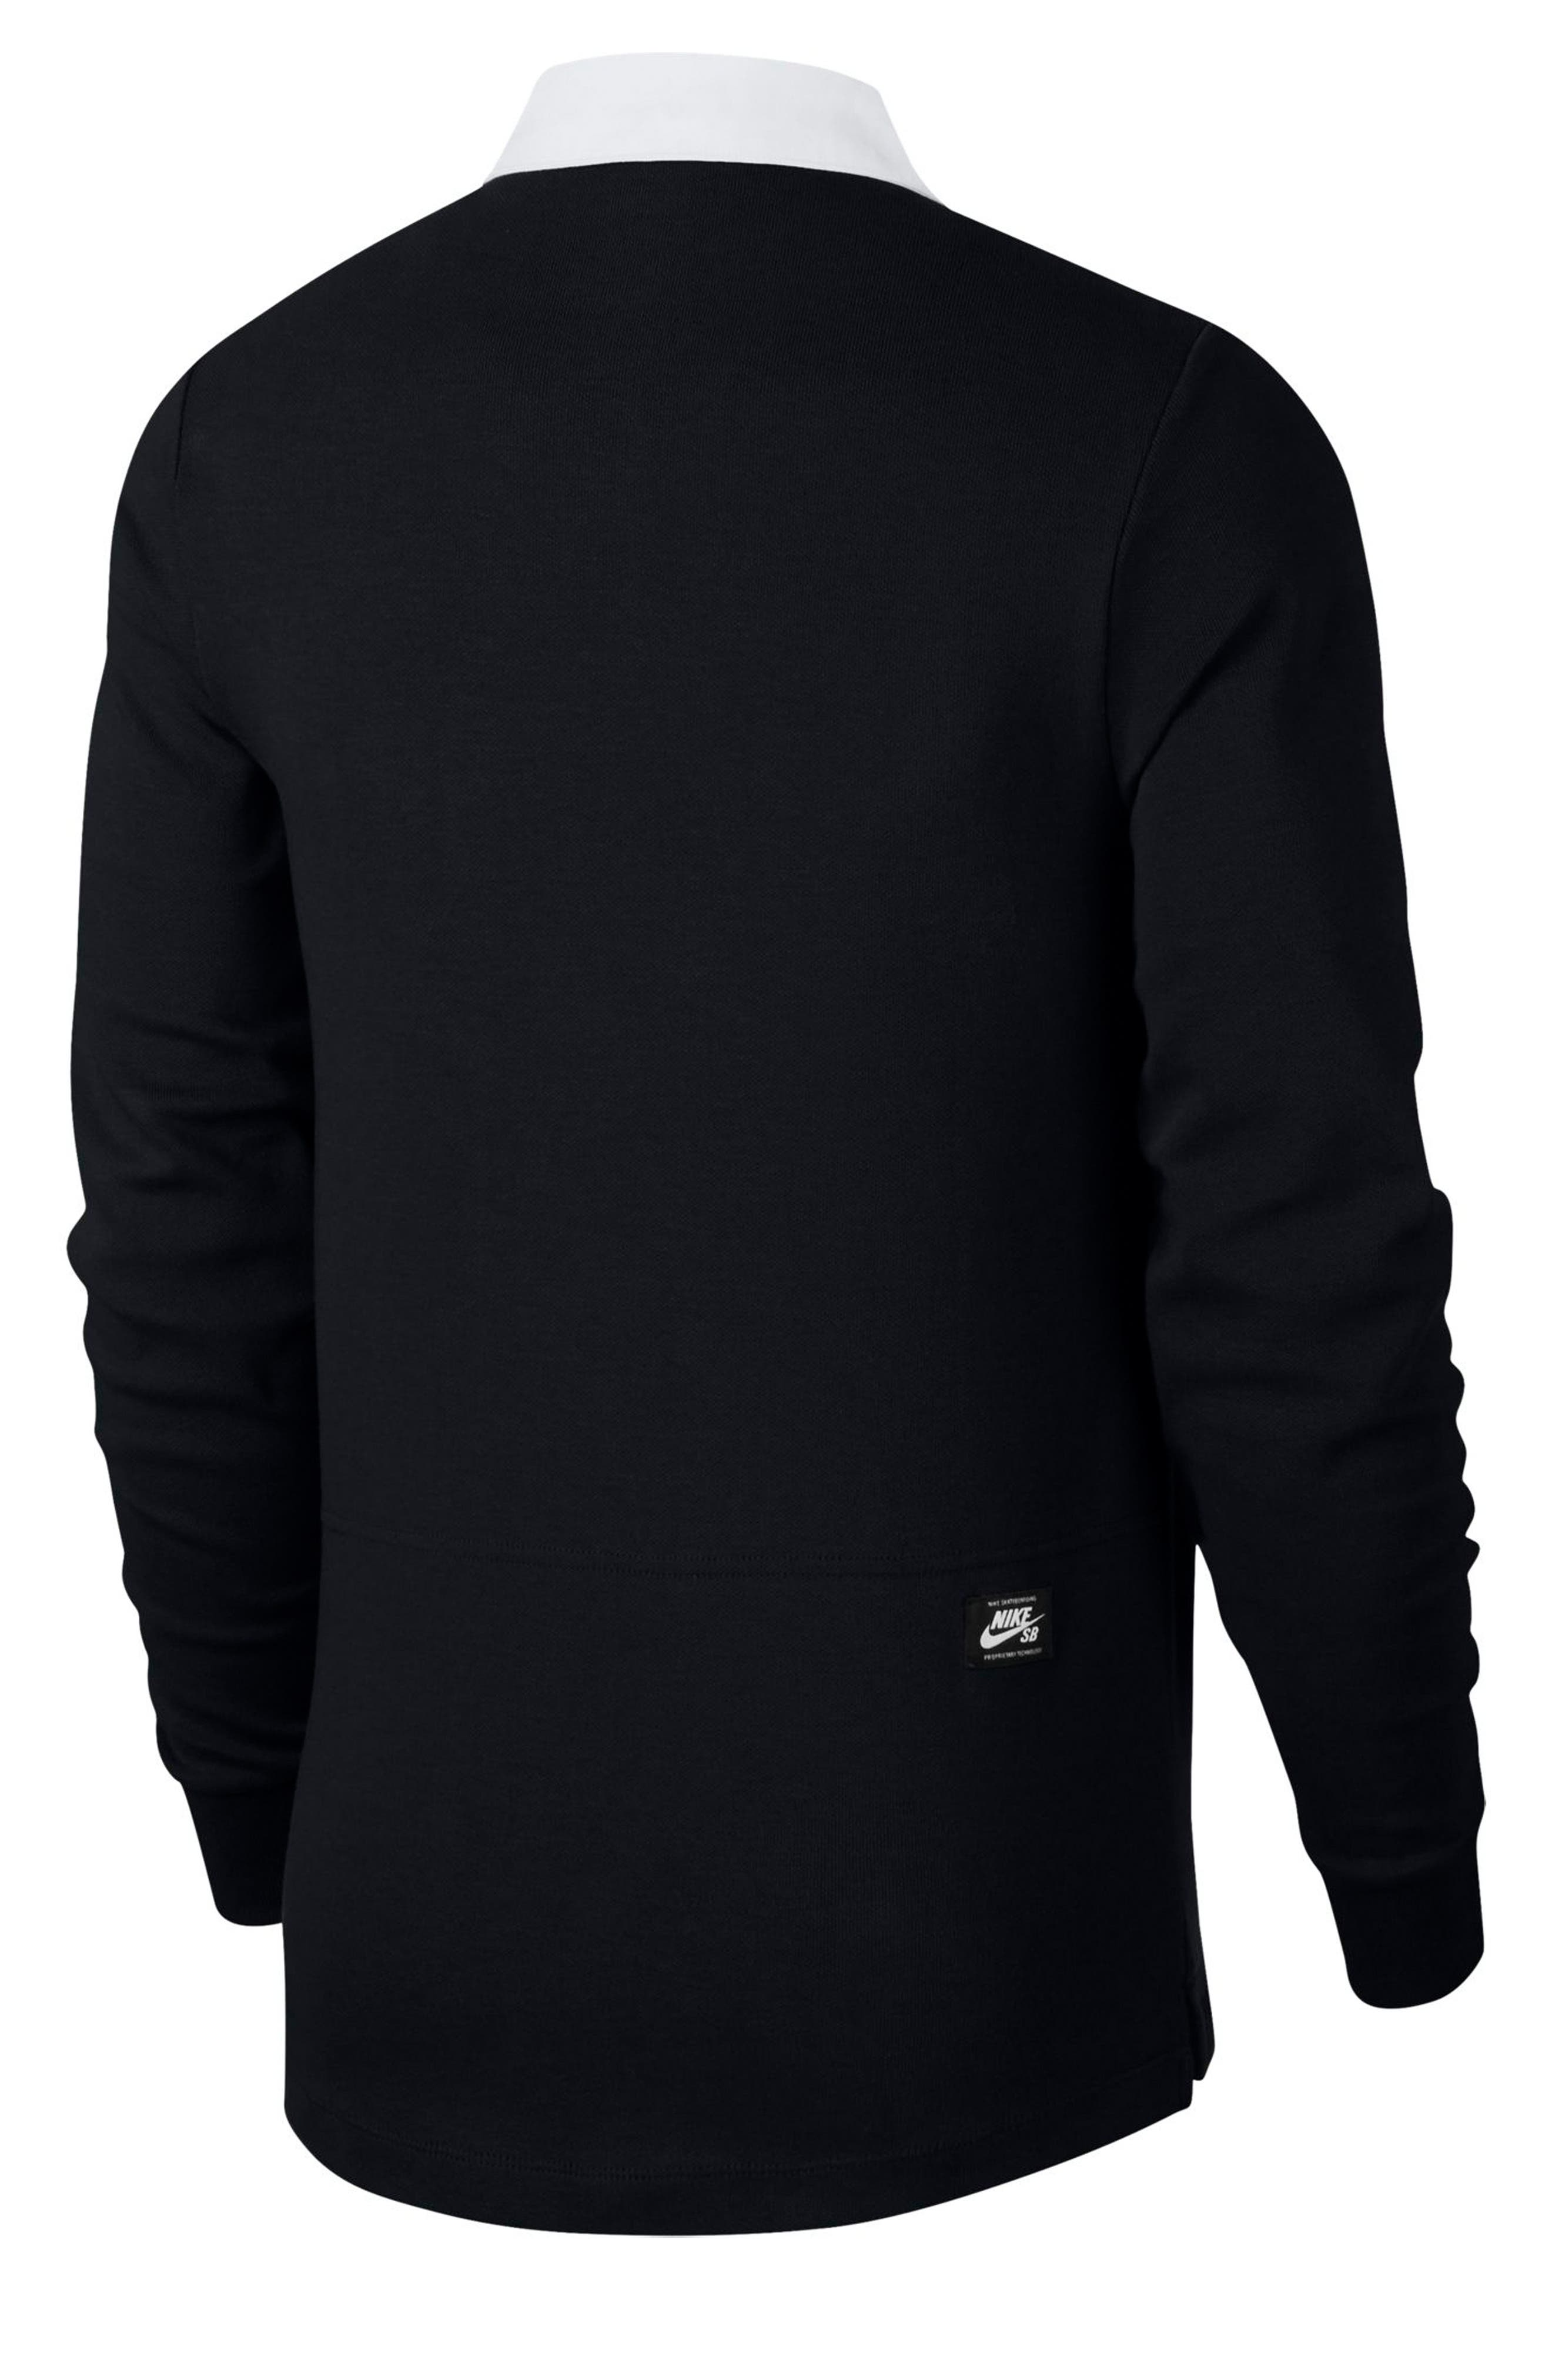 NIKE SB, Nike Dry SB Rugby Polo, Alternate thumbnail 8, color, BLACK/BLACK/BLACK/WHITE